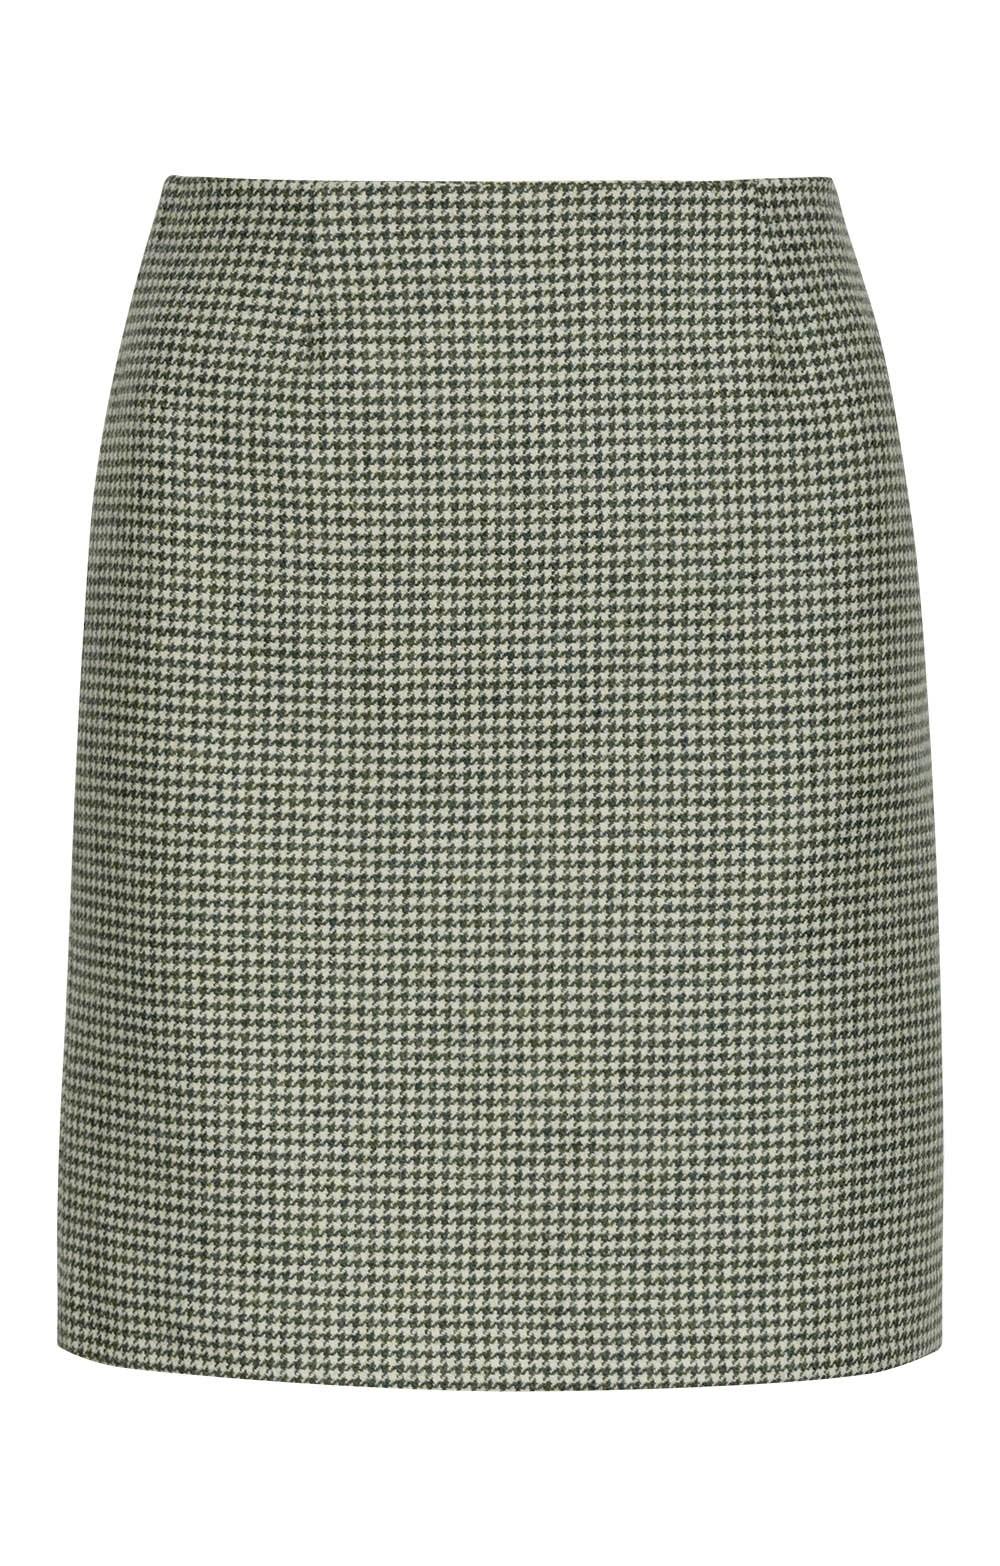 a9c5a19e1962 Puppytooth Straight Skirt - House of Bruar